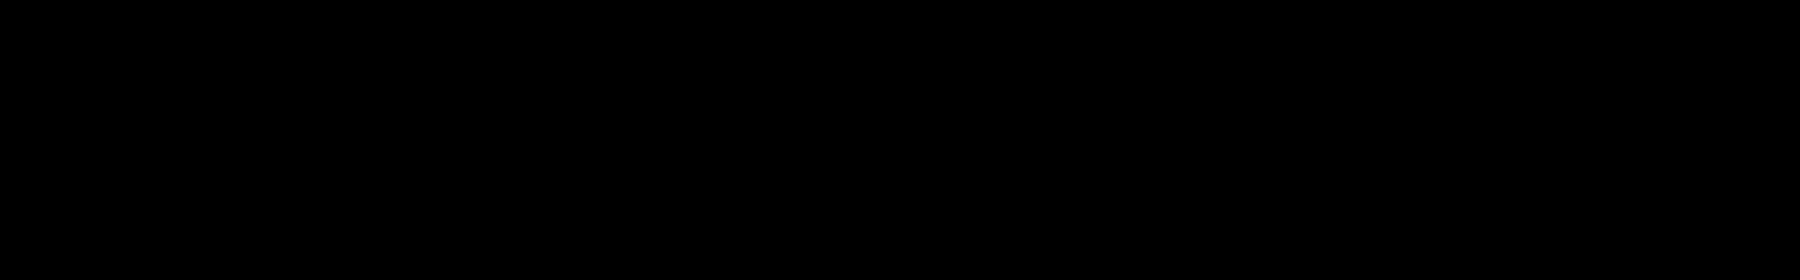 DRIP audio waveform